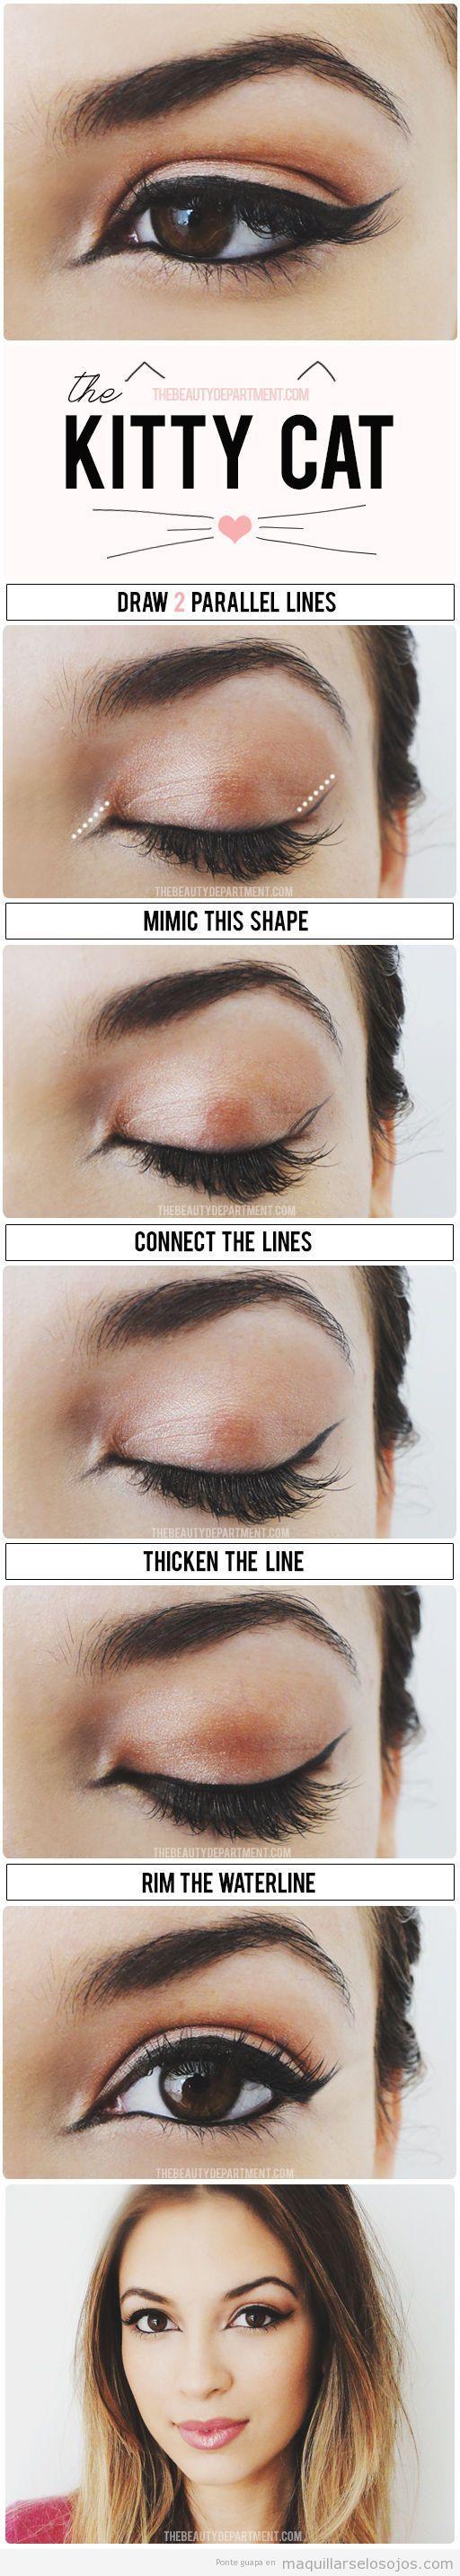 Tutorial aprender paso a paso a dibujar línea del ojo con rabillo